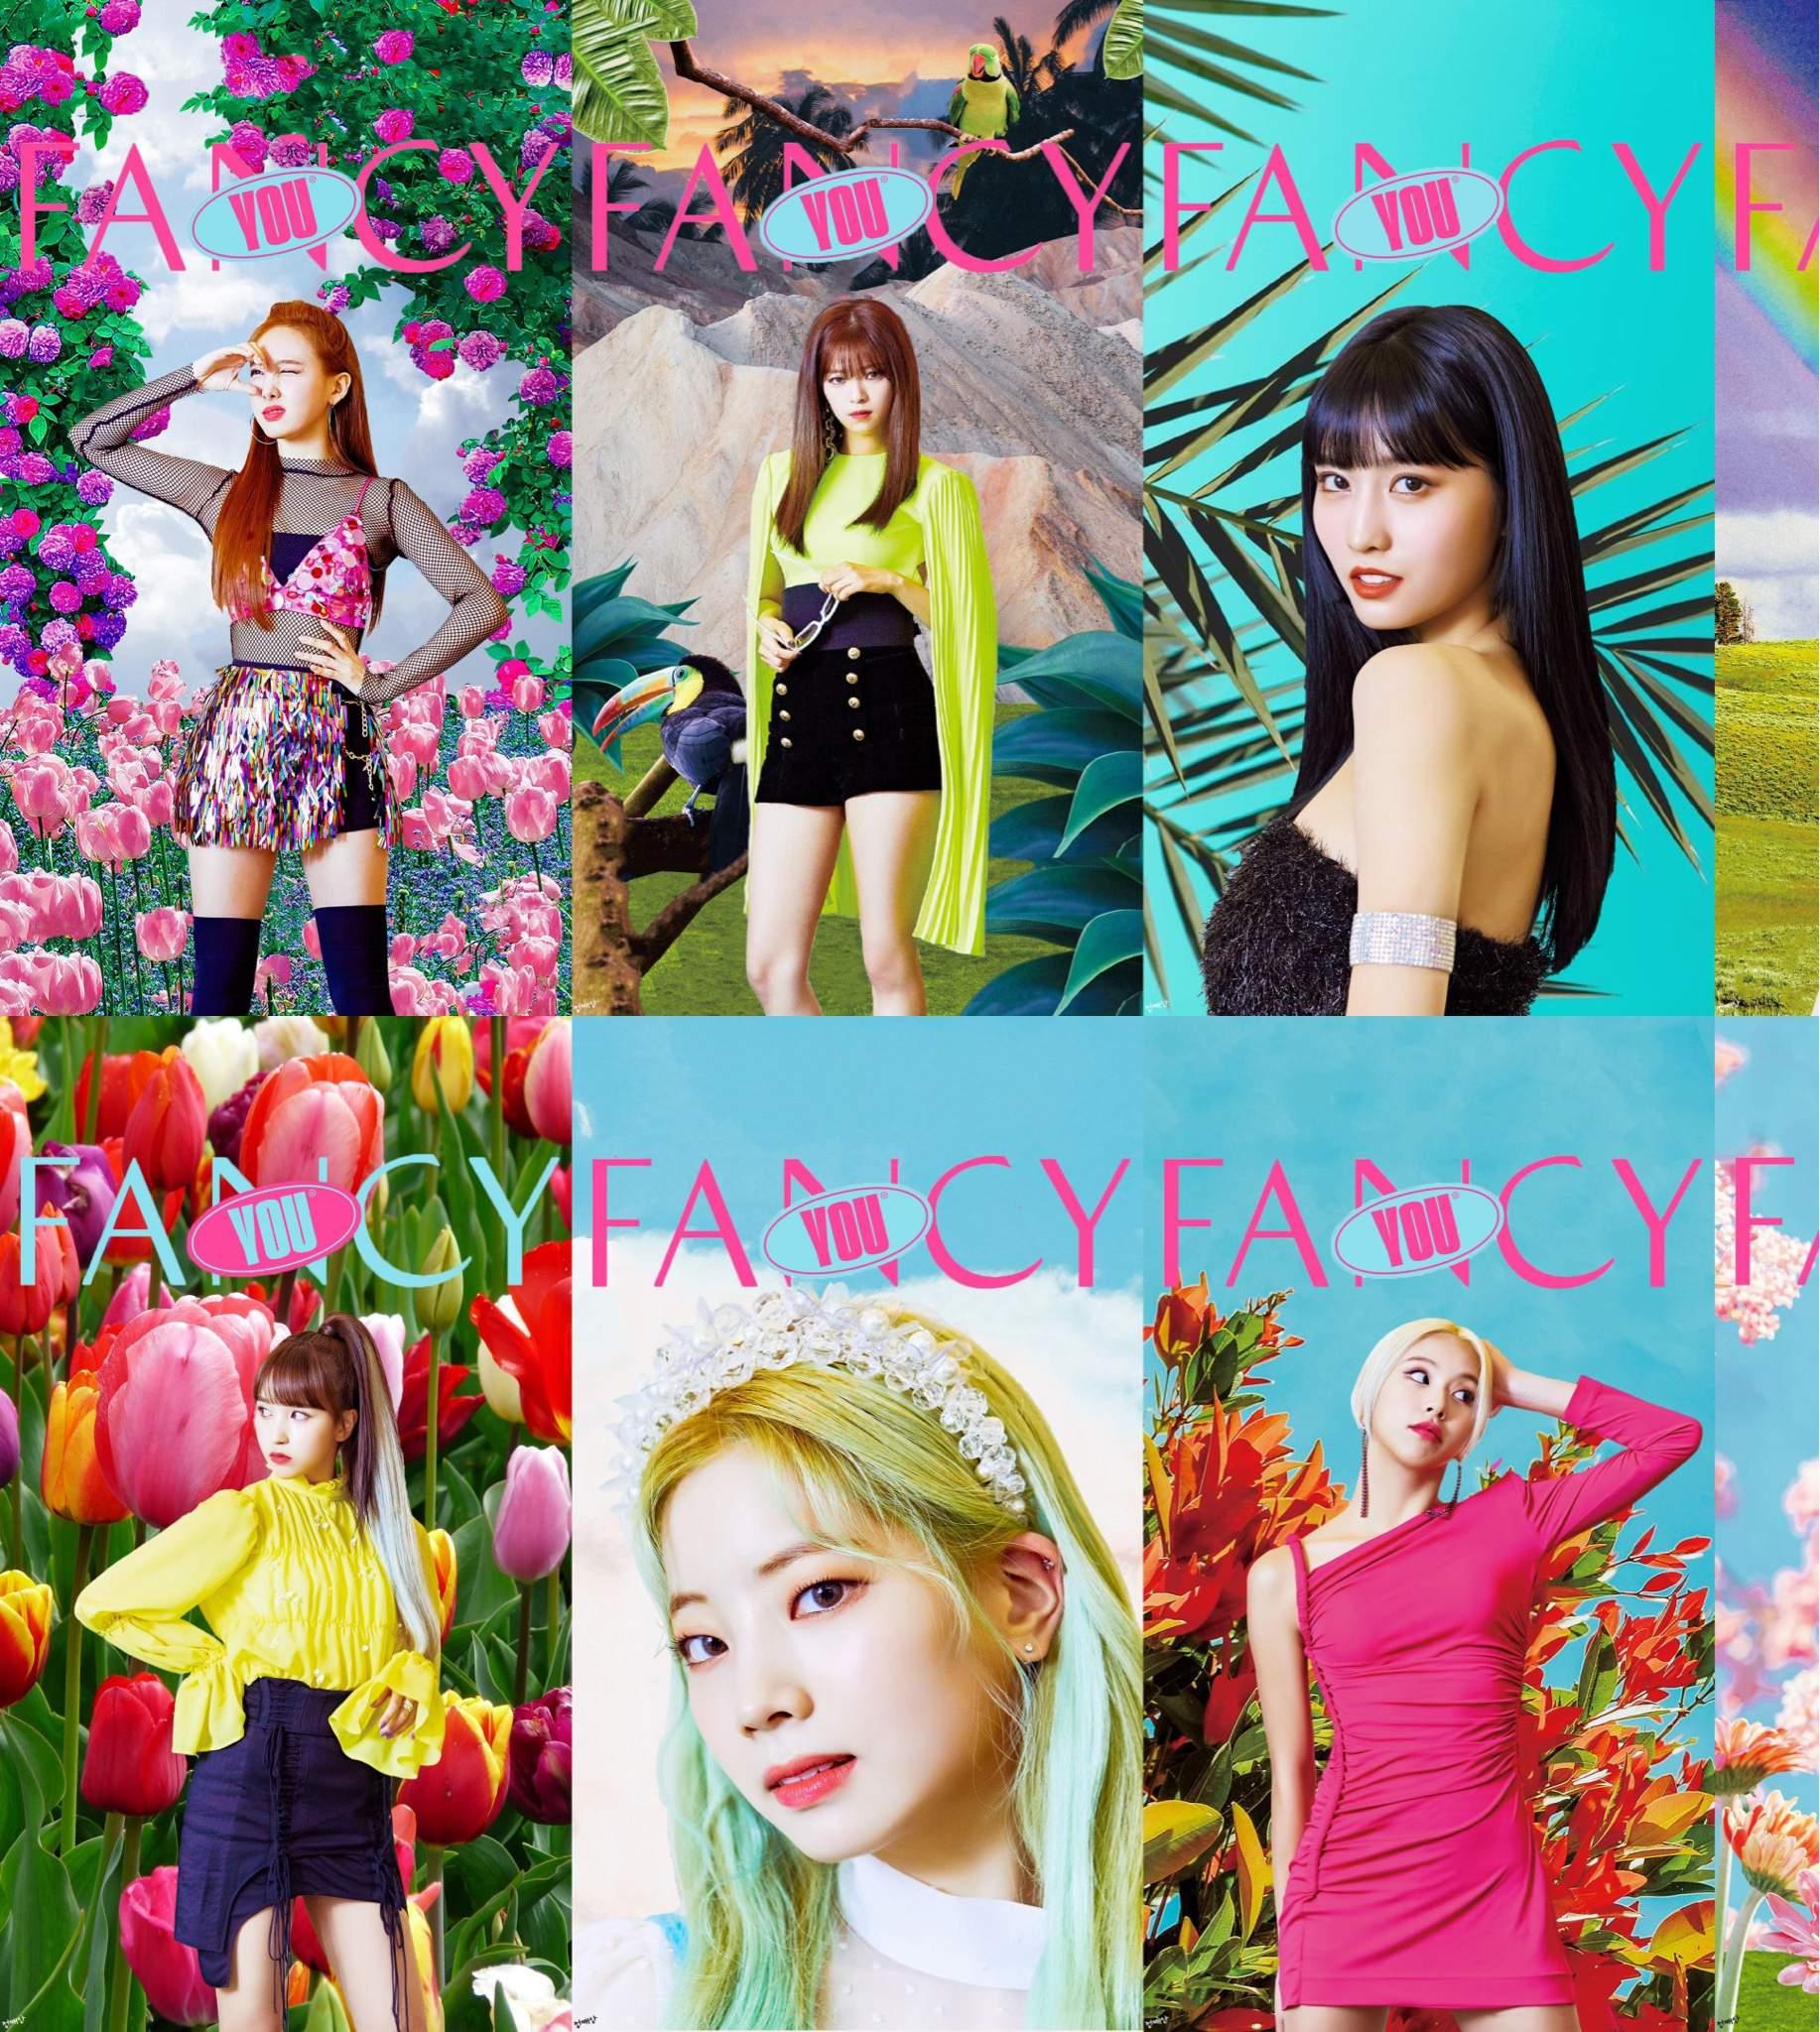 Wallpaper] TWICE FANCY YOU | Twice (트와이스)ㅤ Amino